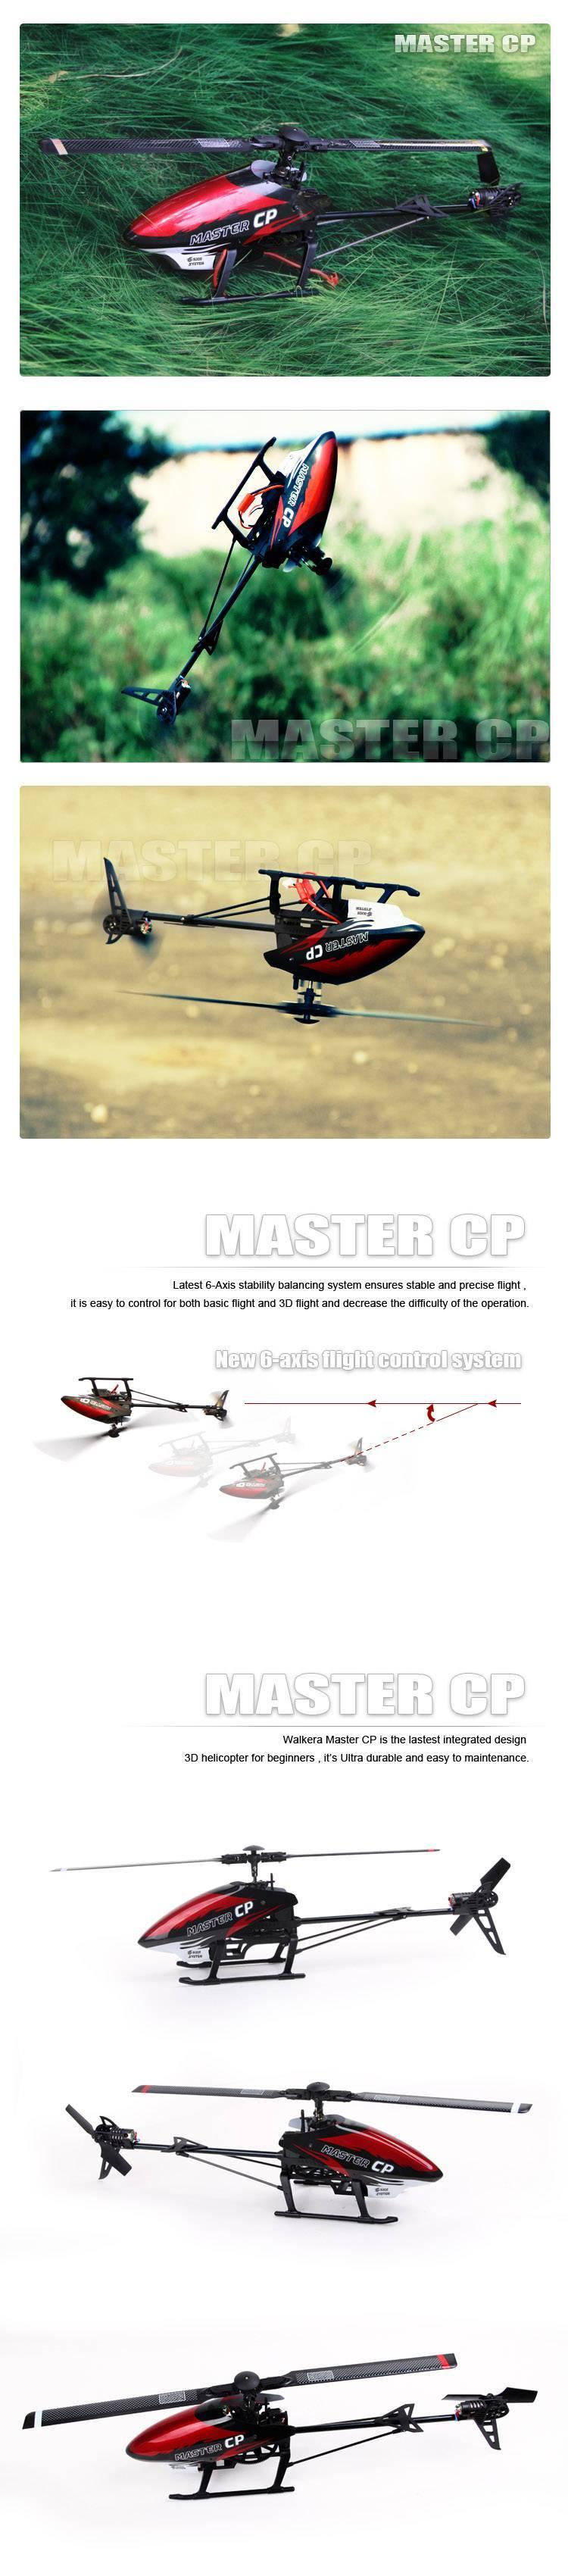 Master_CP_1.jpg